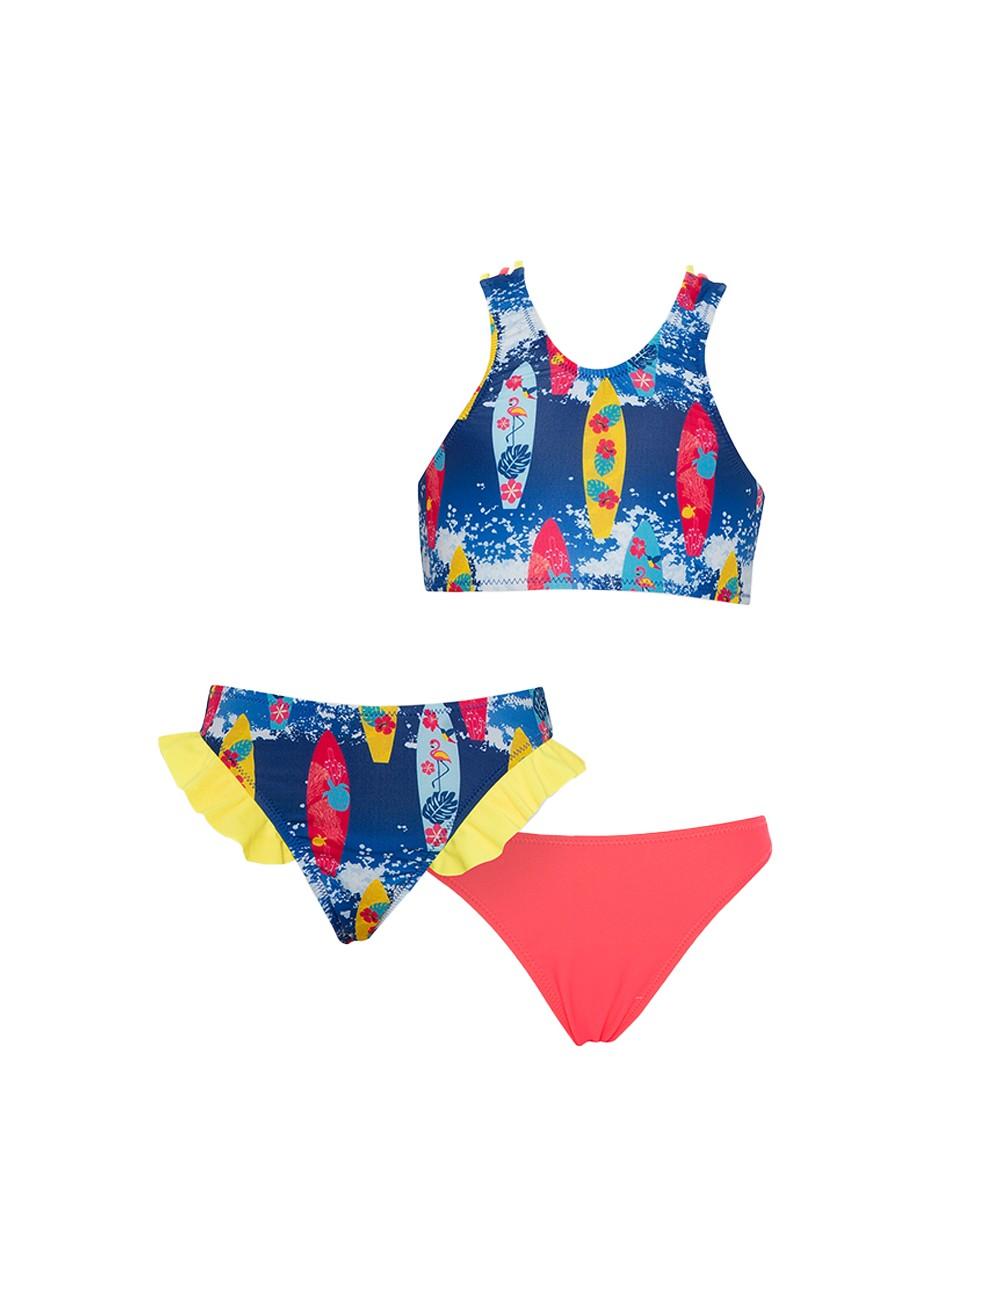 Tortue Παιδικό / Εφηβικό Μαγιό Bikini με 2 Slip S1-042-123 Lamoda.gr